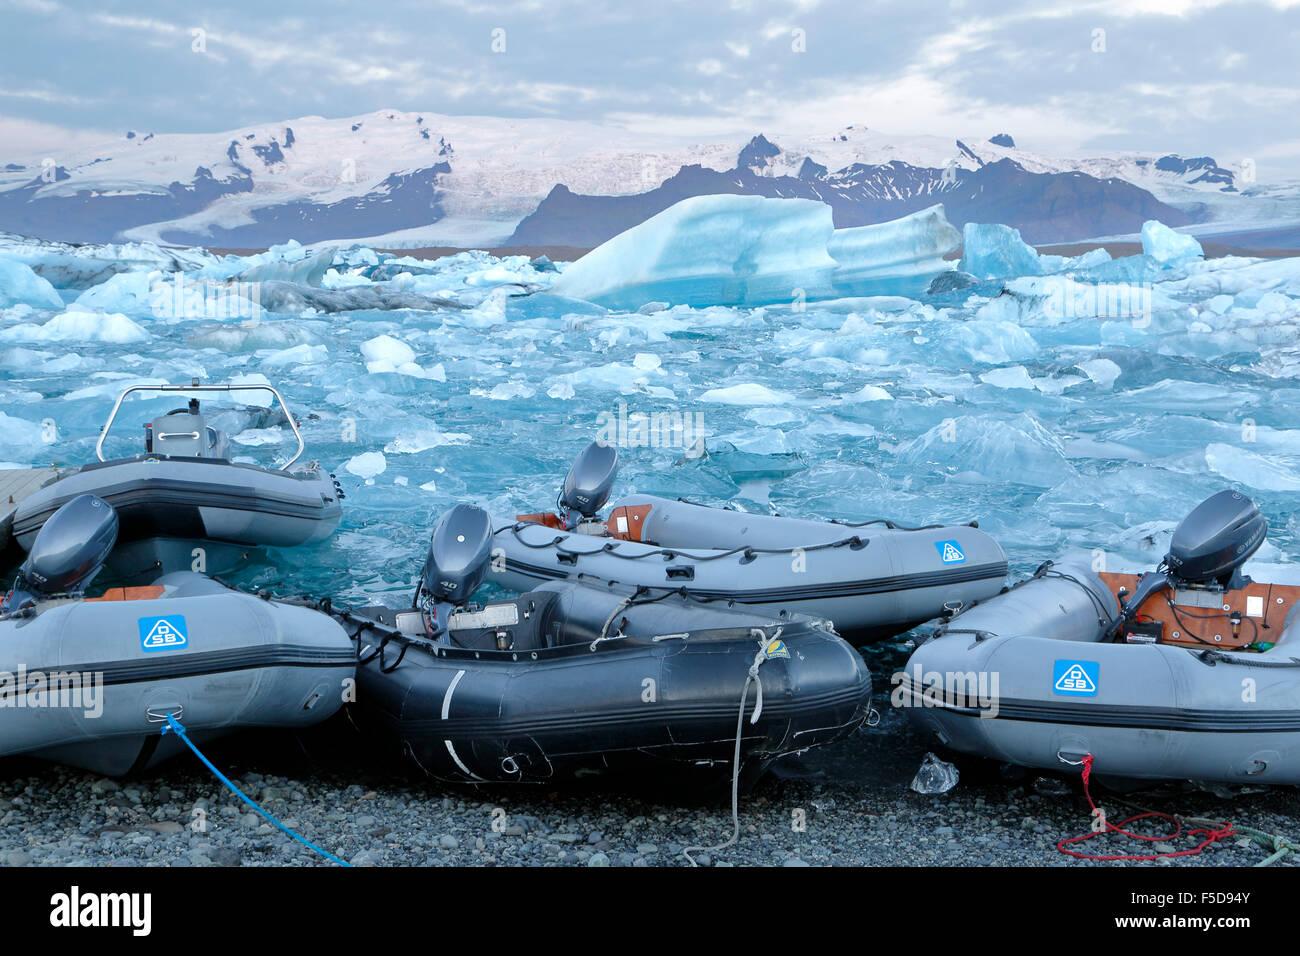 Canotti, iceberg e montagne coperte di neve, Jokulsarlon laguna glaciale, Vatnajokull National Park, Islanda Immagini Stock